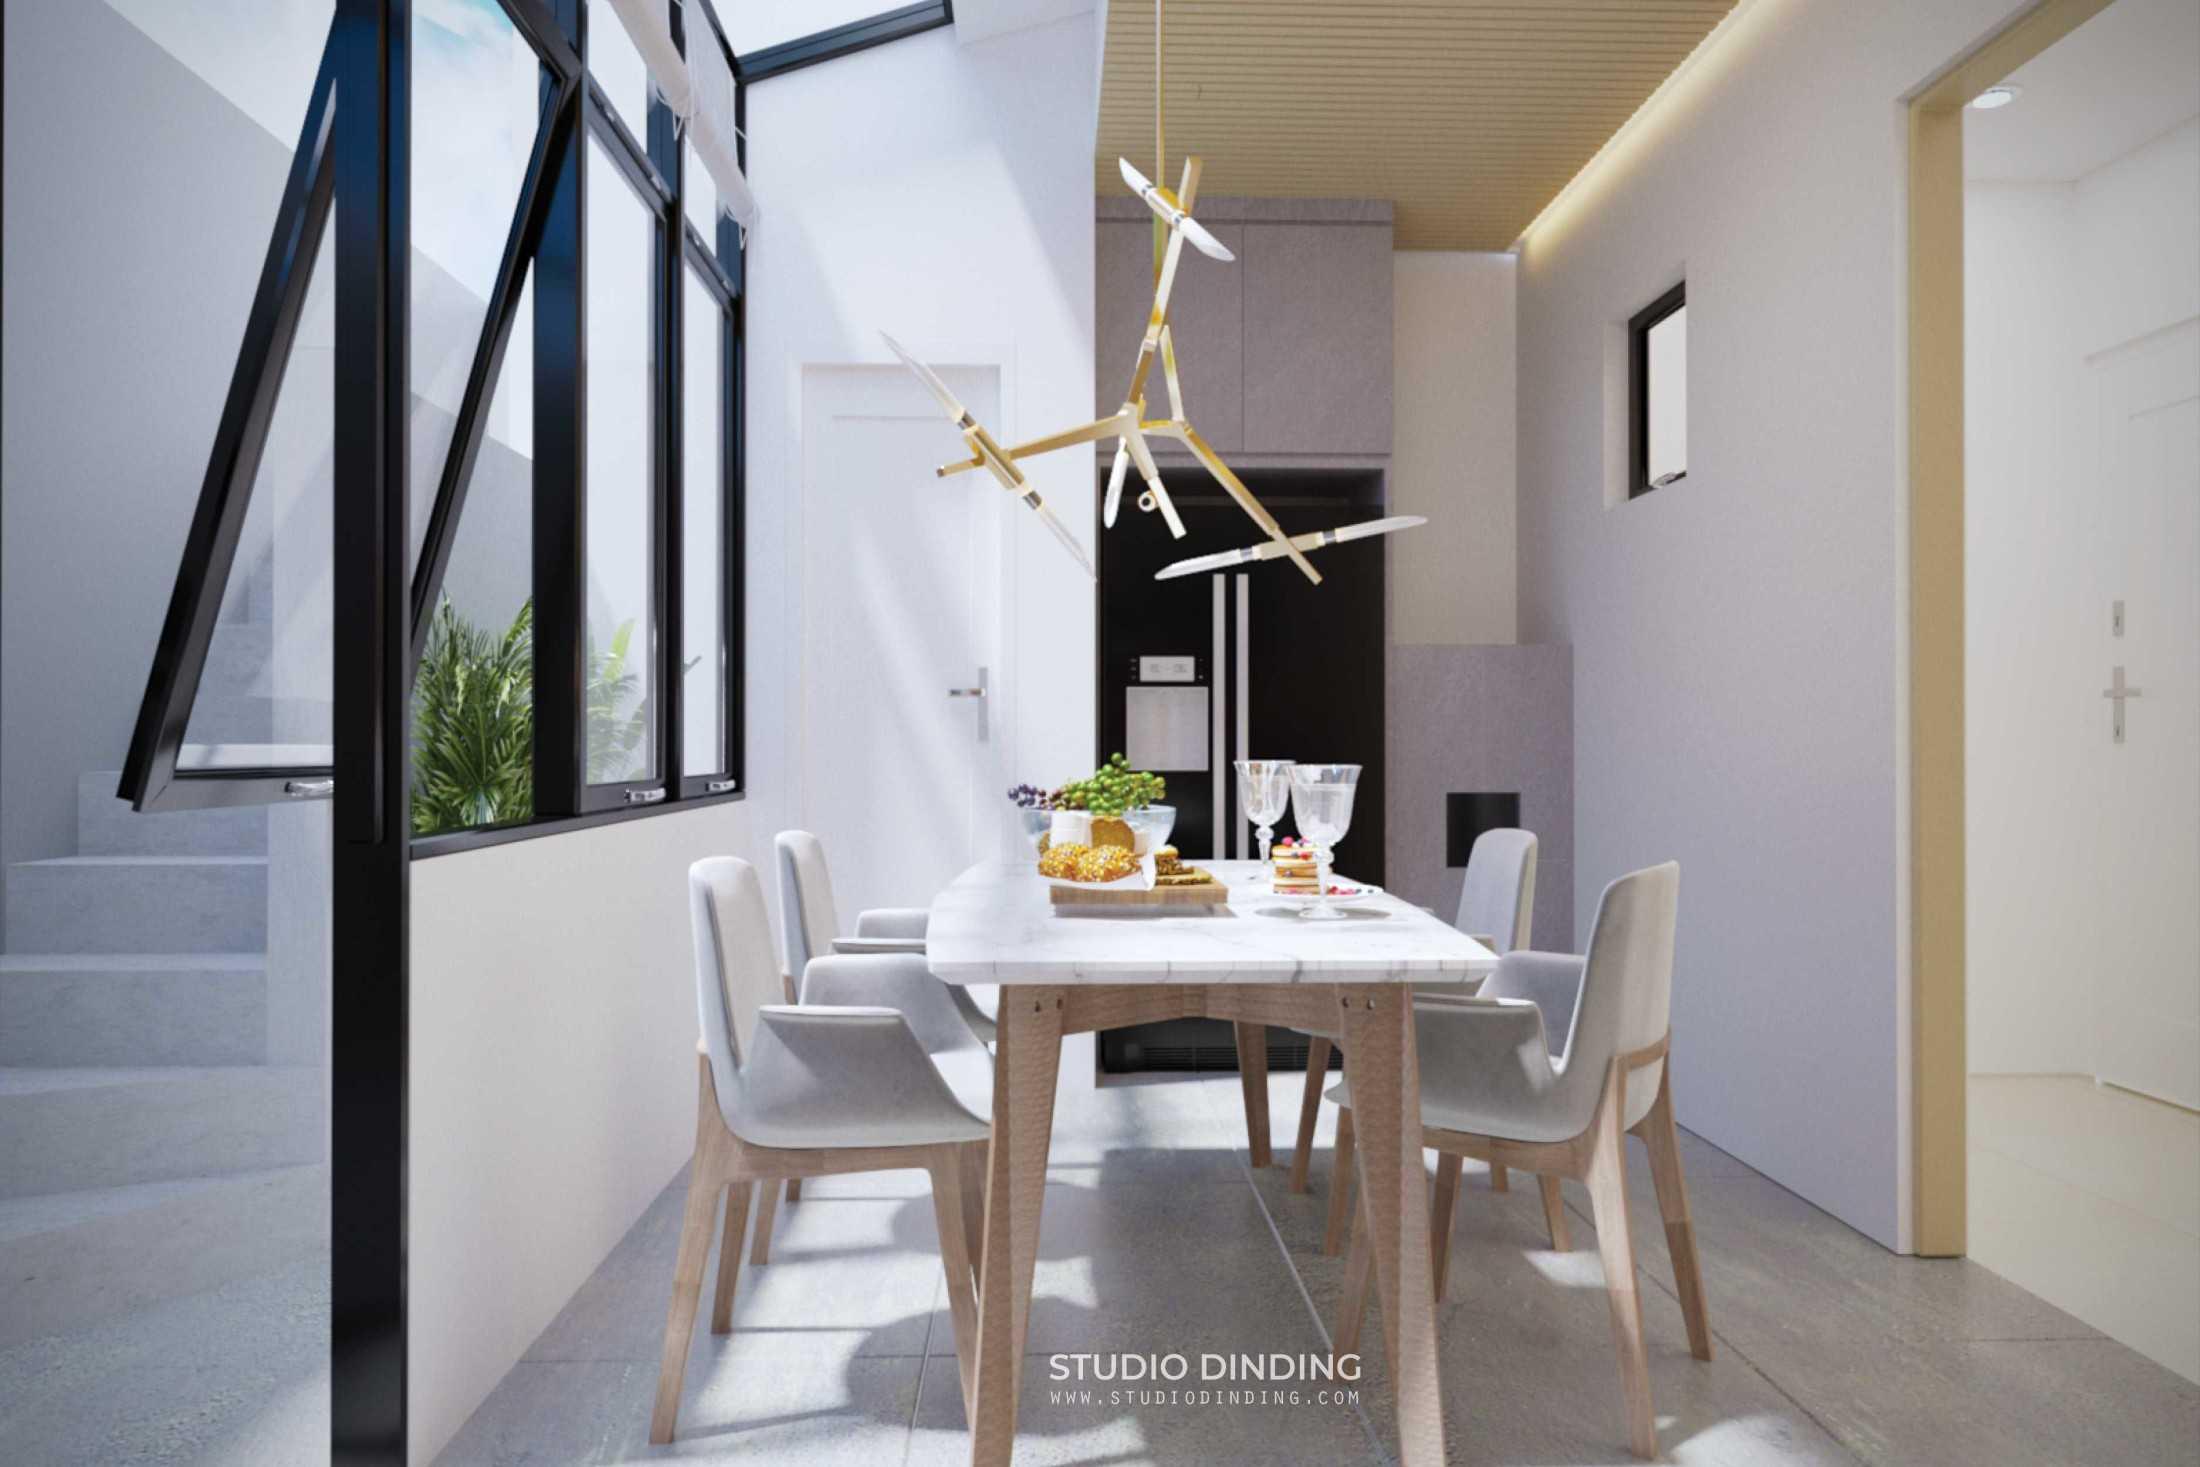 Studio Dinding Michelia 7 House Serpong, Kota Tangerang Selatan, Banten, Indonesia Serpong, Kota Tangerang Selatan, Banten, Indonesia Studio-Dinding-Michelia-7-House  56948